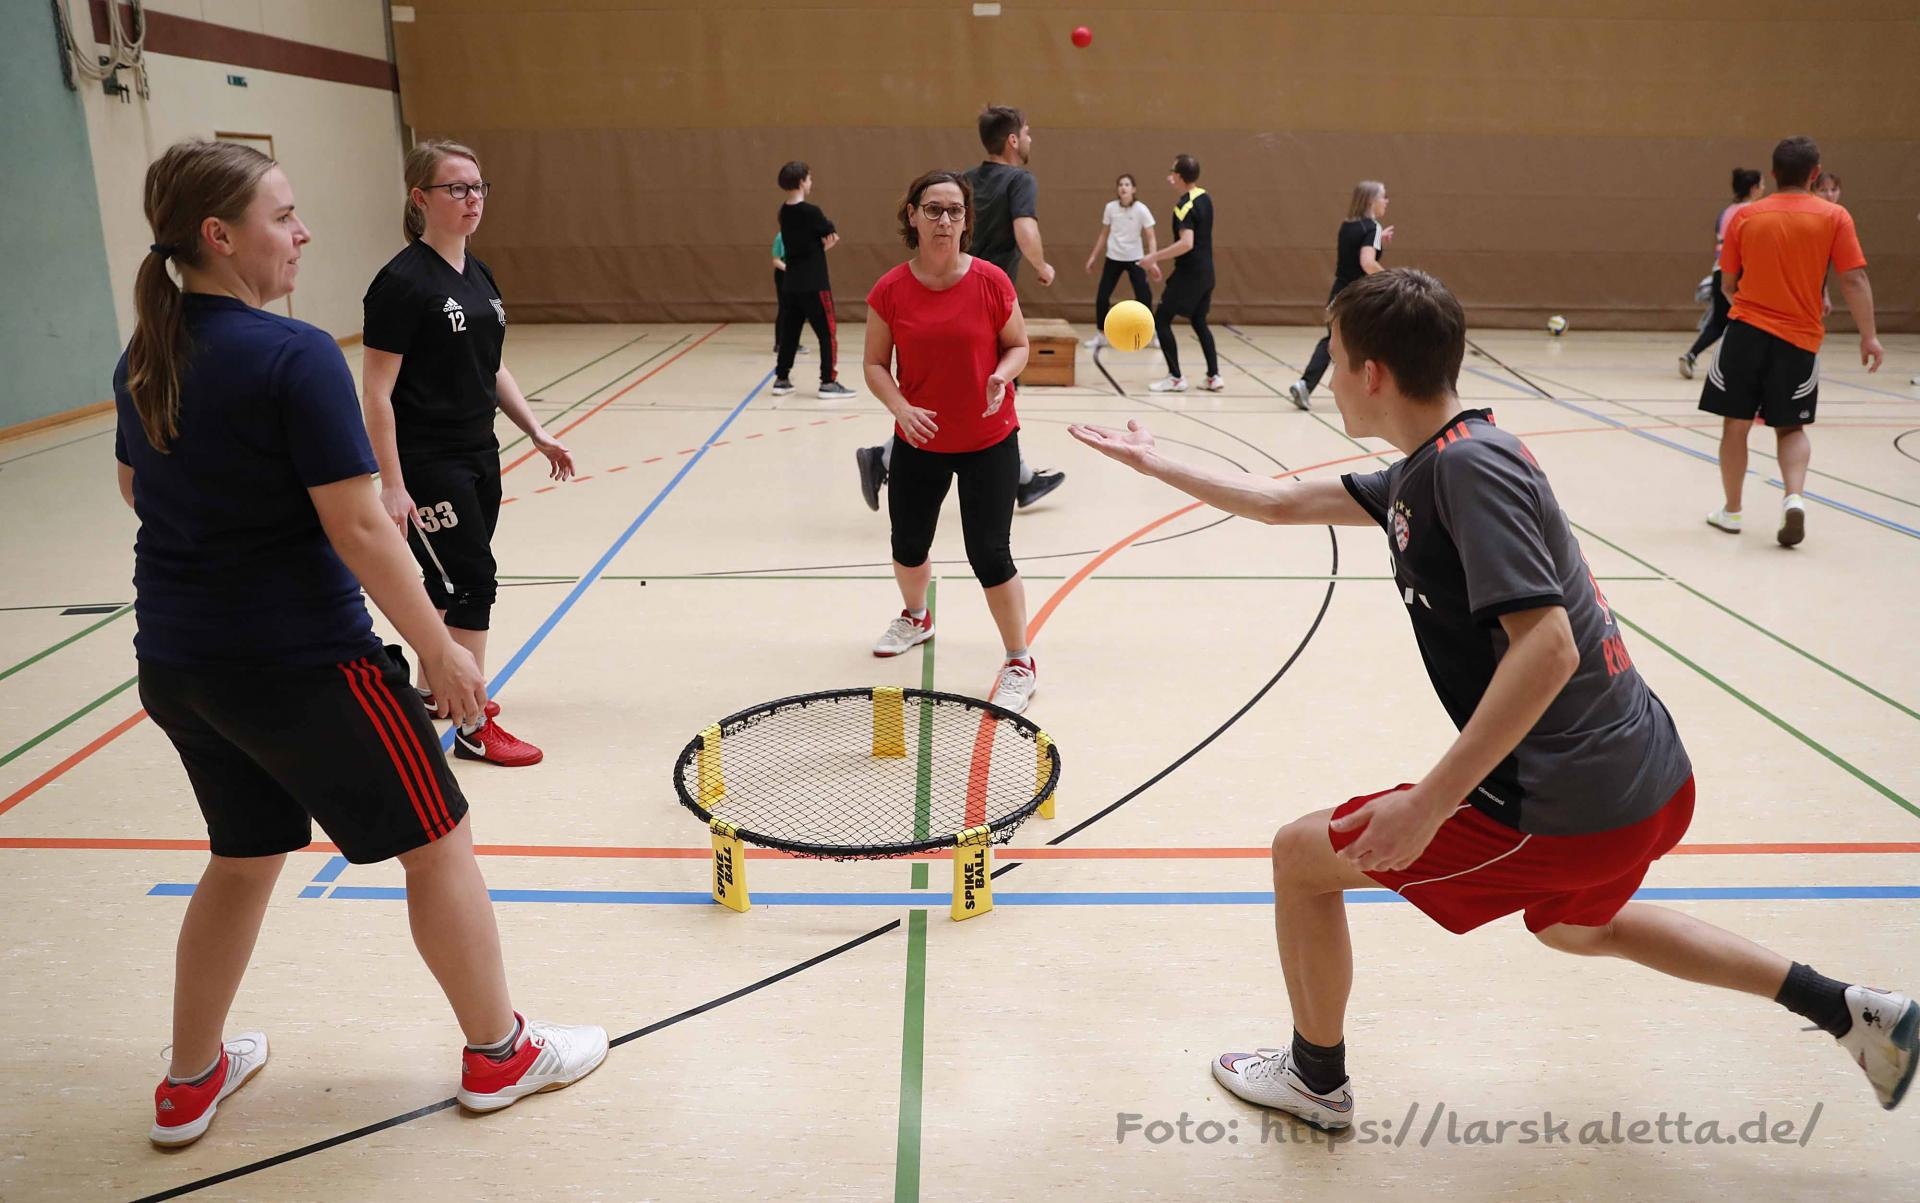 Lars-Kaletta_go-sports-2019-19